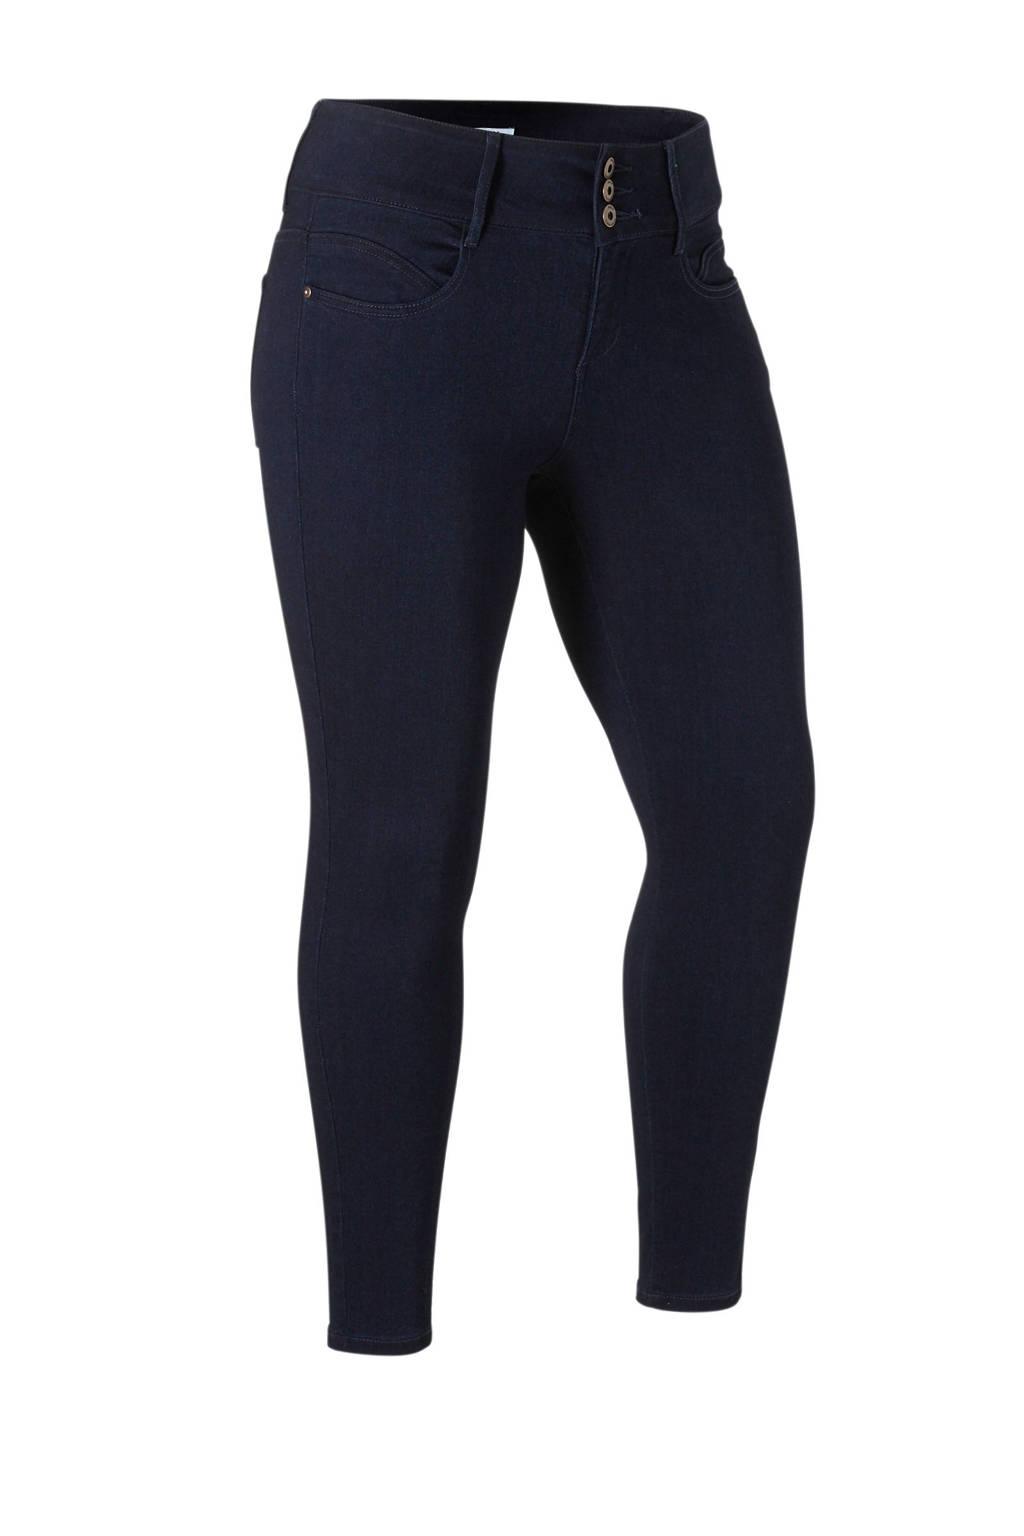 ONLY CARMAKOMA high waist skinny jeans dark denim, Dark denim